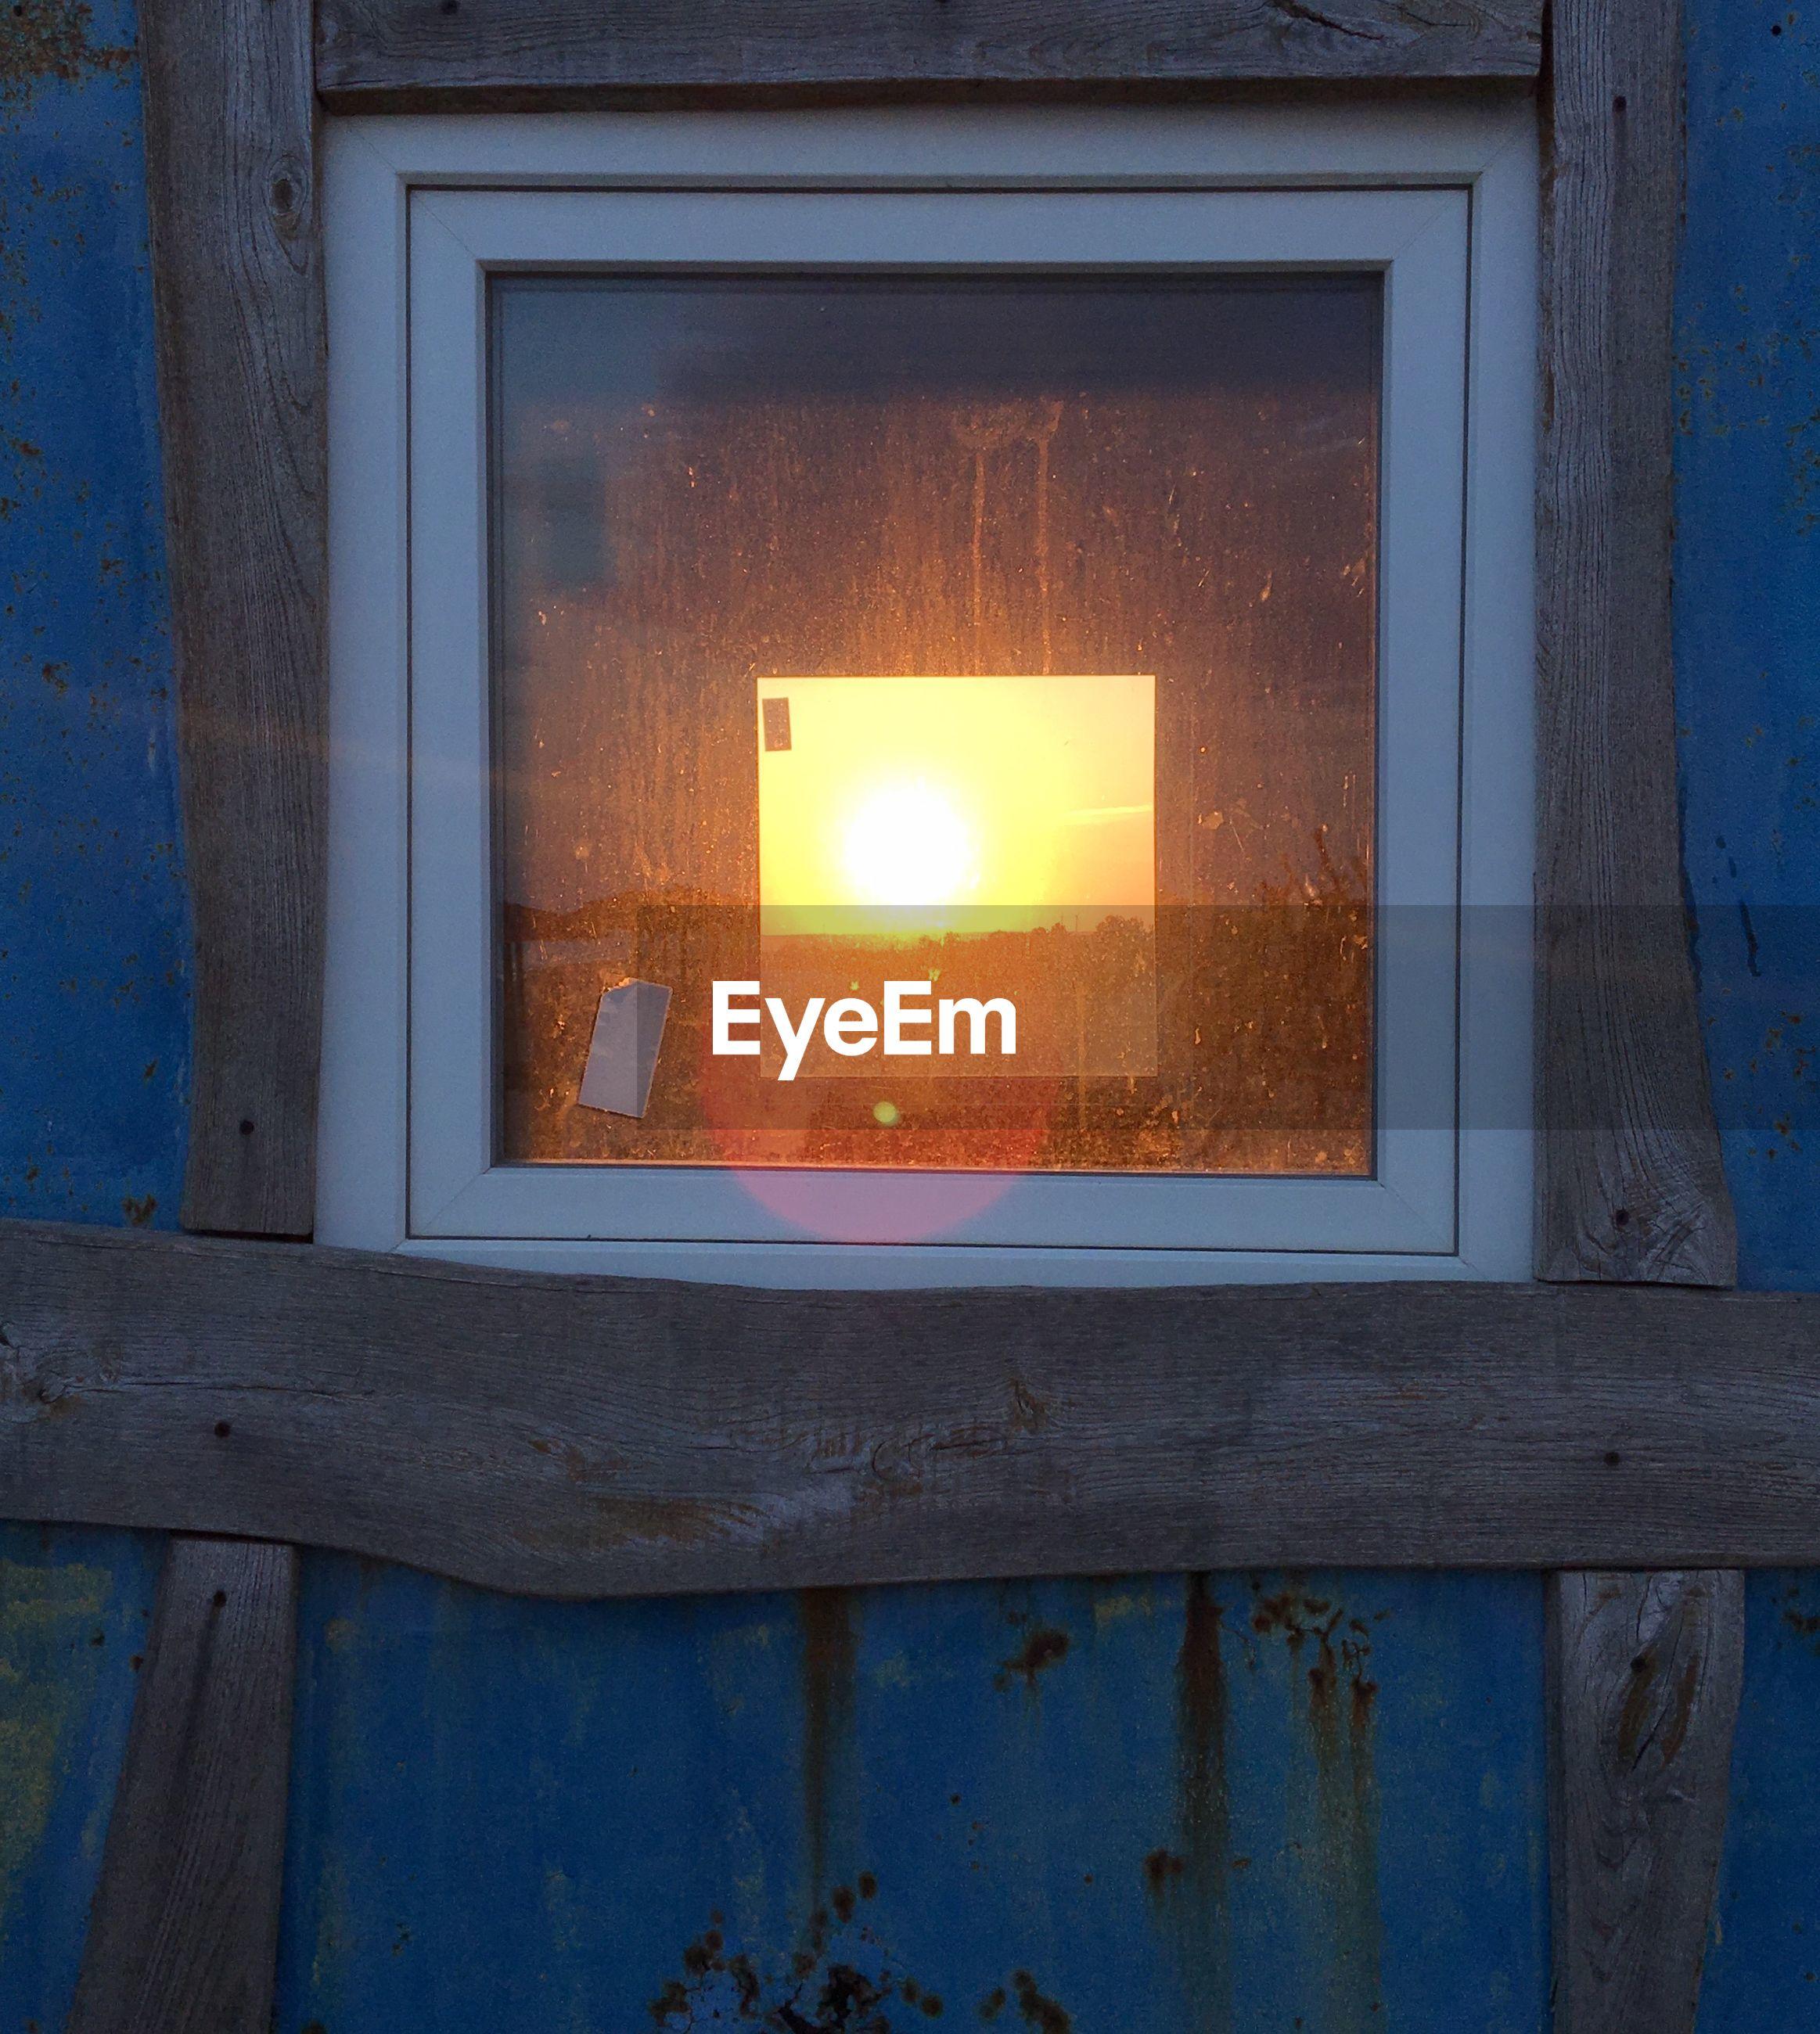 CLOSE-UP OF WINDOW IN ILLUMINATED BUILDING